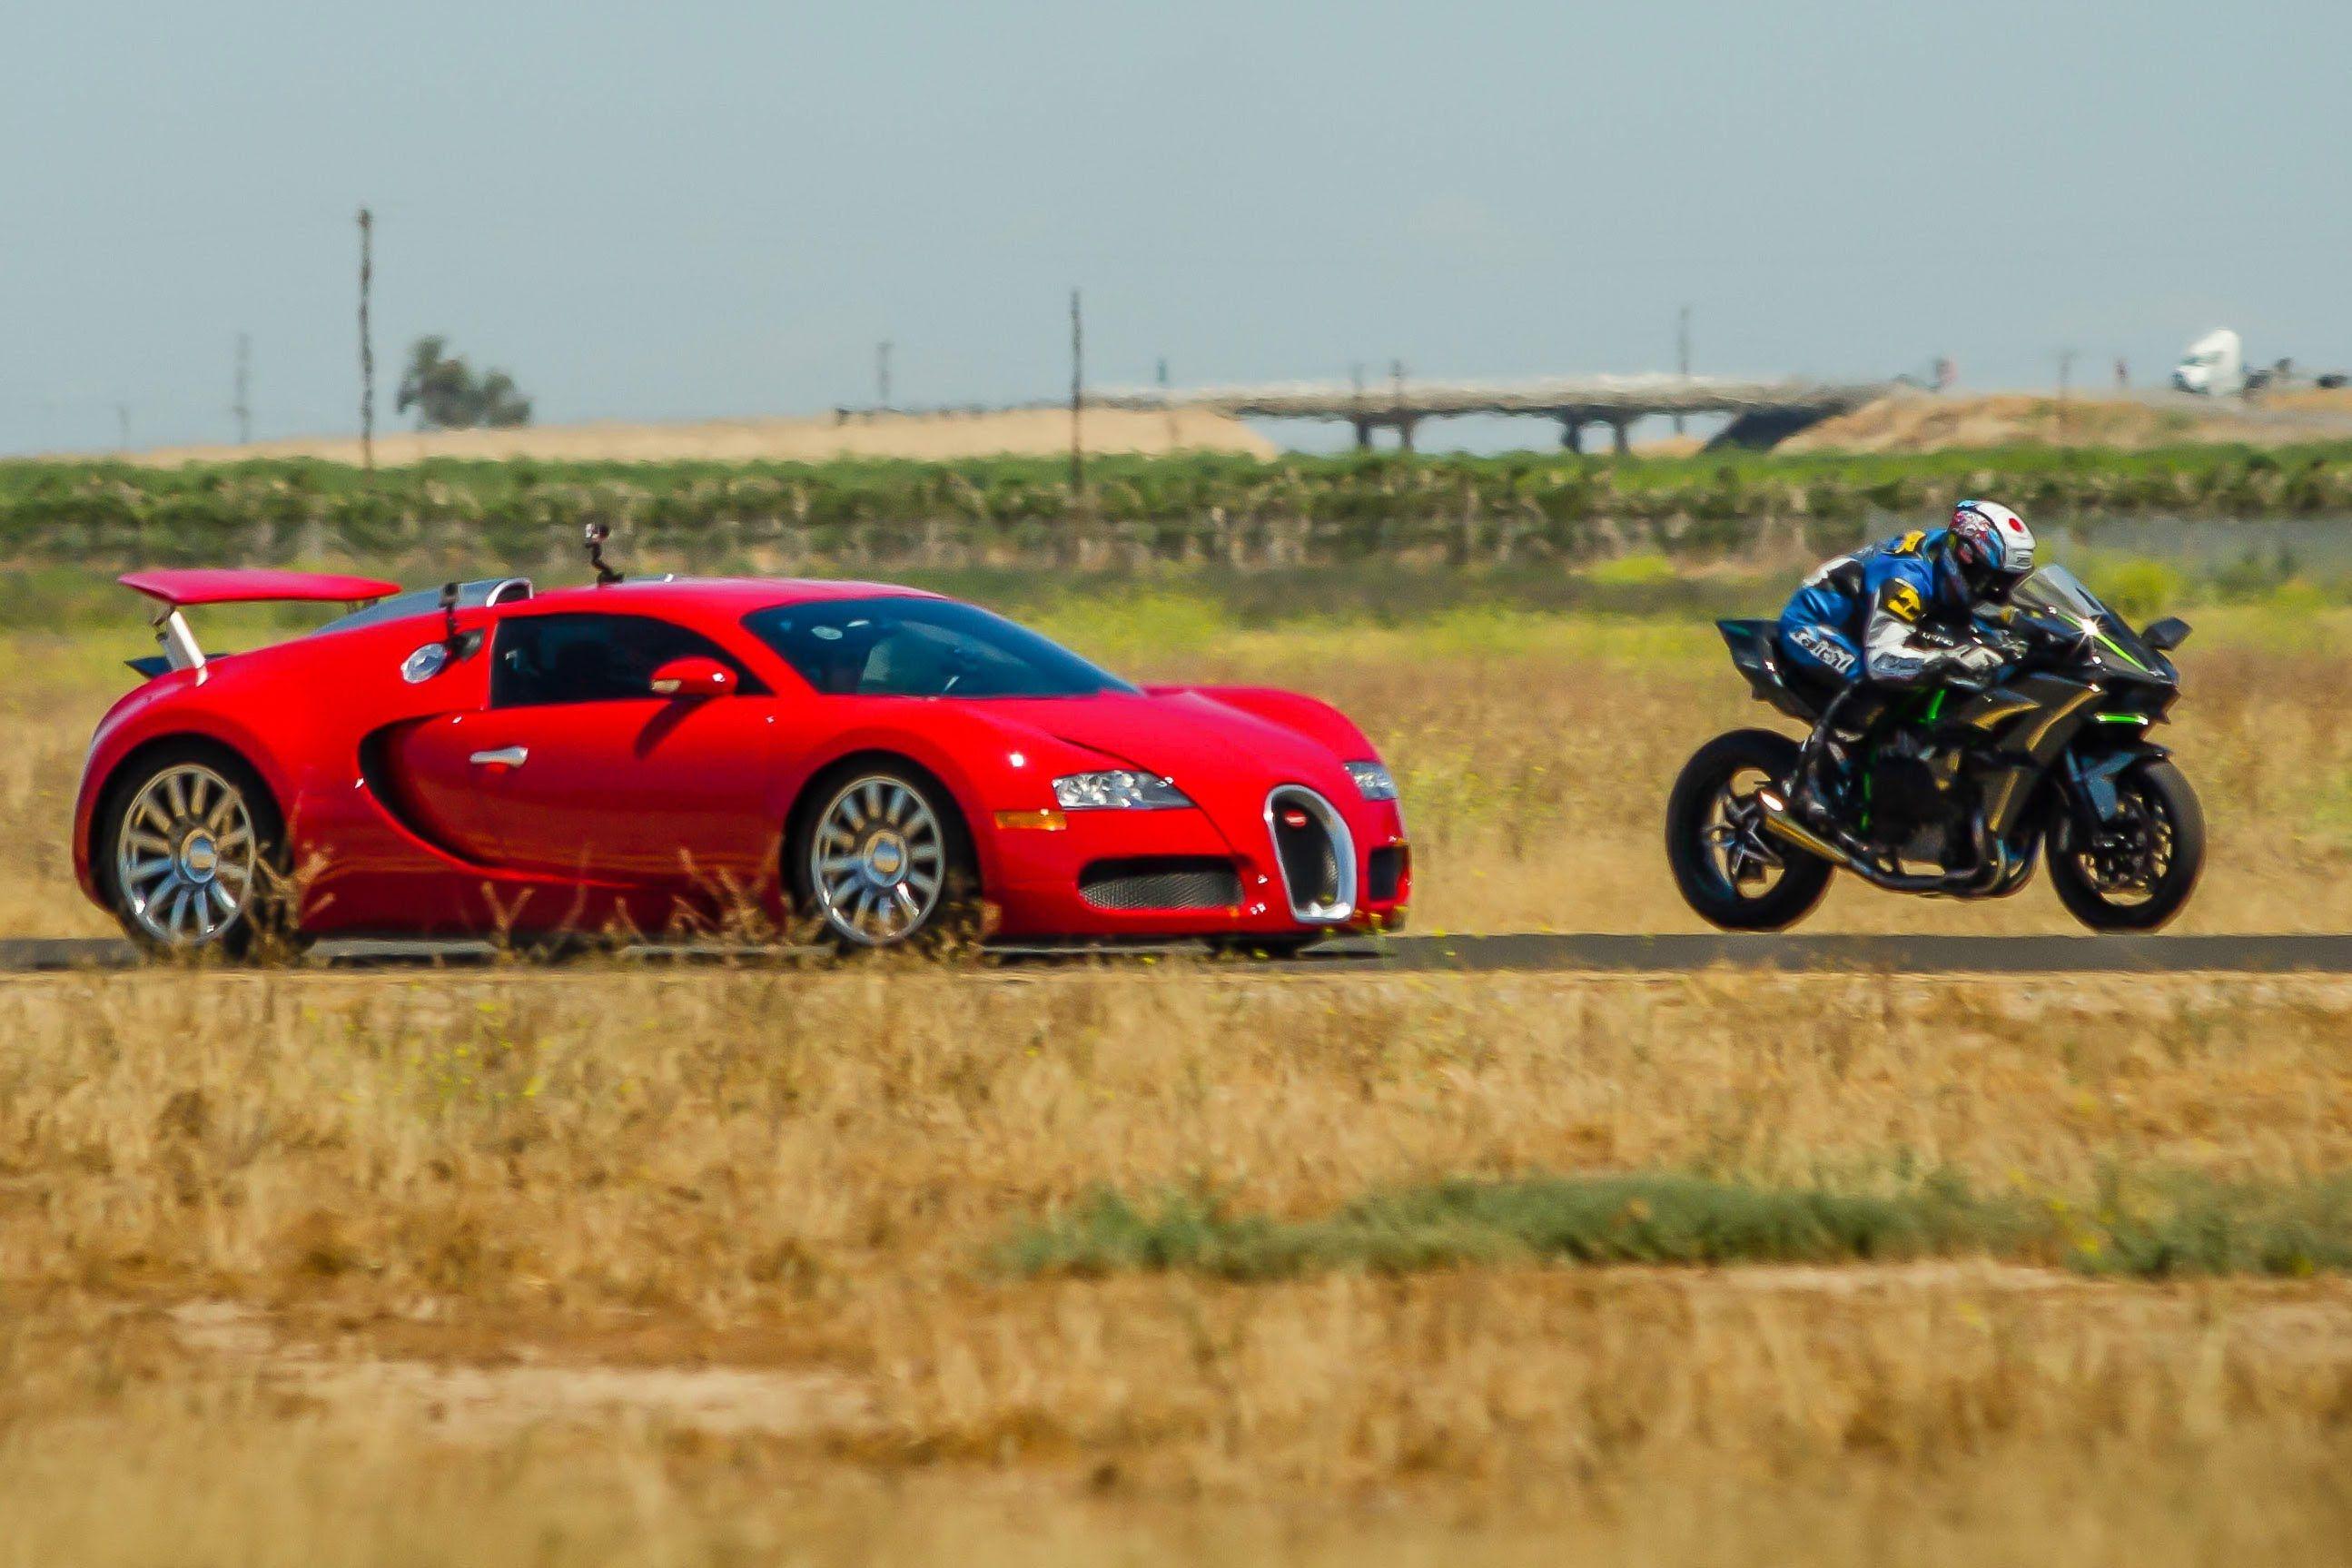 Kawasaki H2r Vs Bugatti Veyron Supercar 1 2 Mile Airstrip Race 2